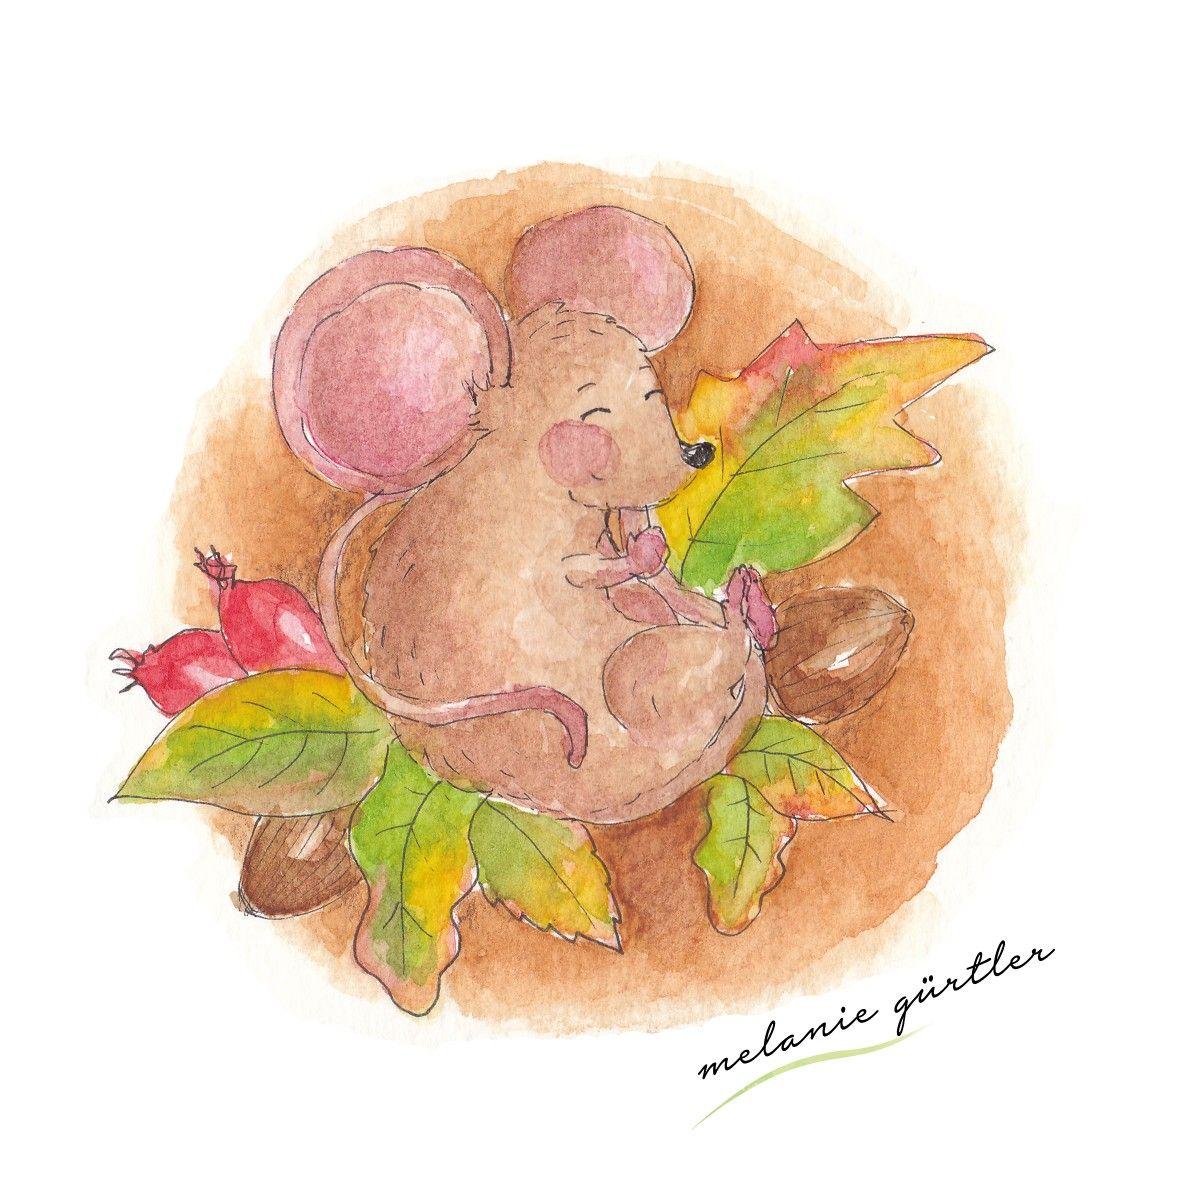 Maus Herbst Illustration Niedlich Kinderbuch Aquarell Tiere